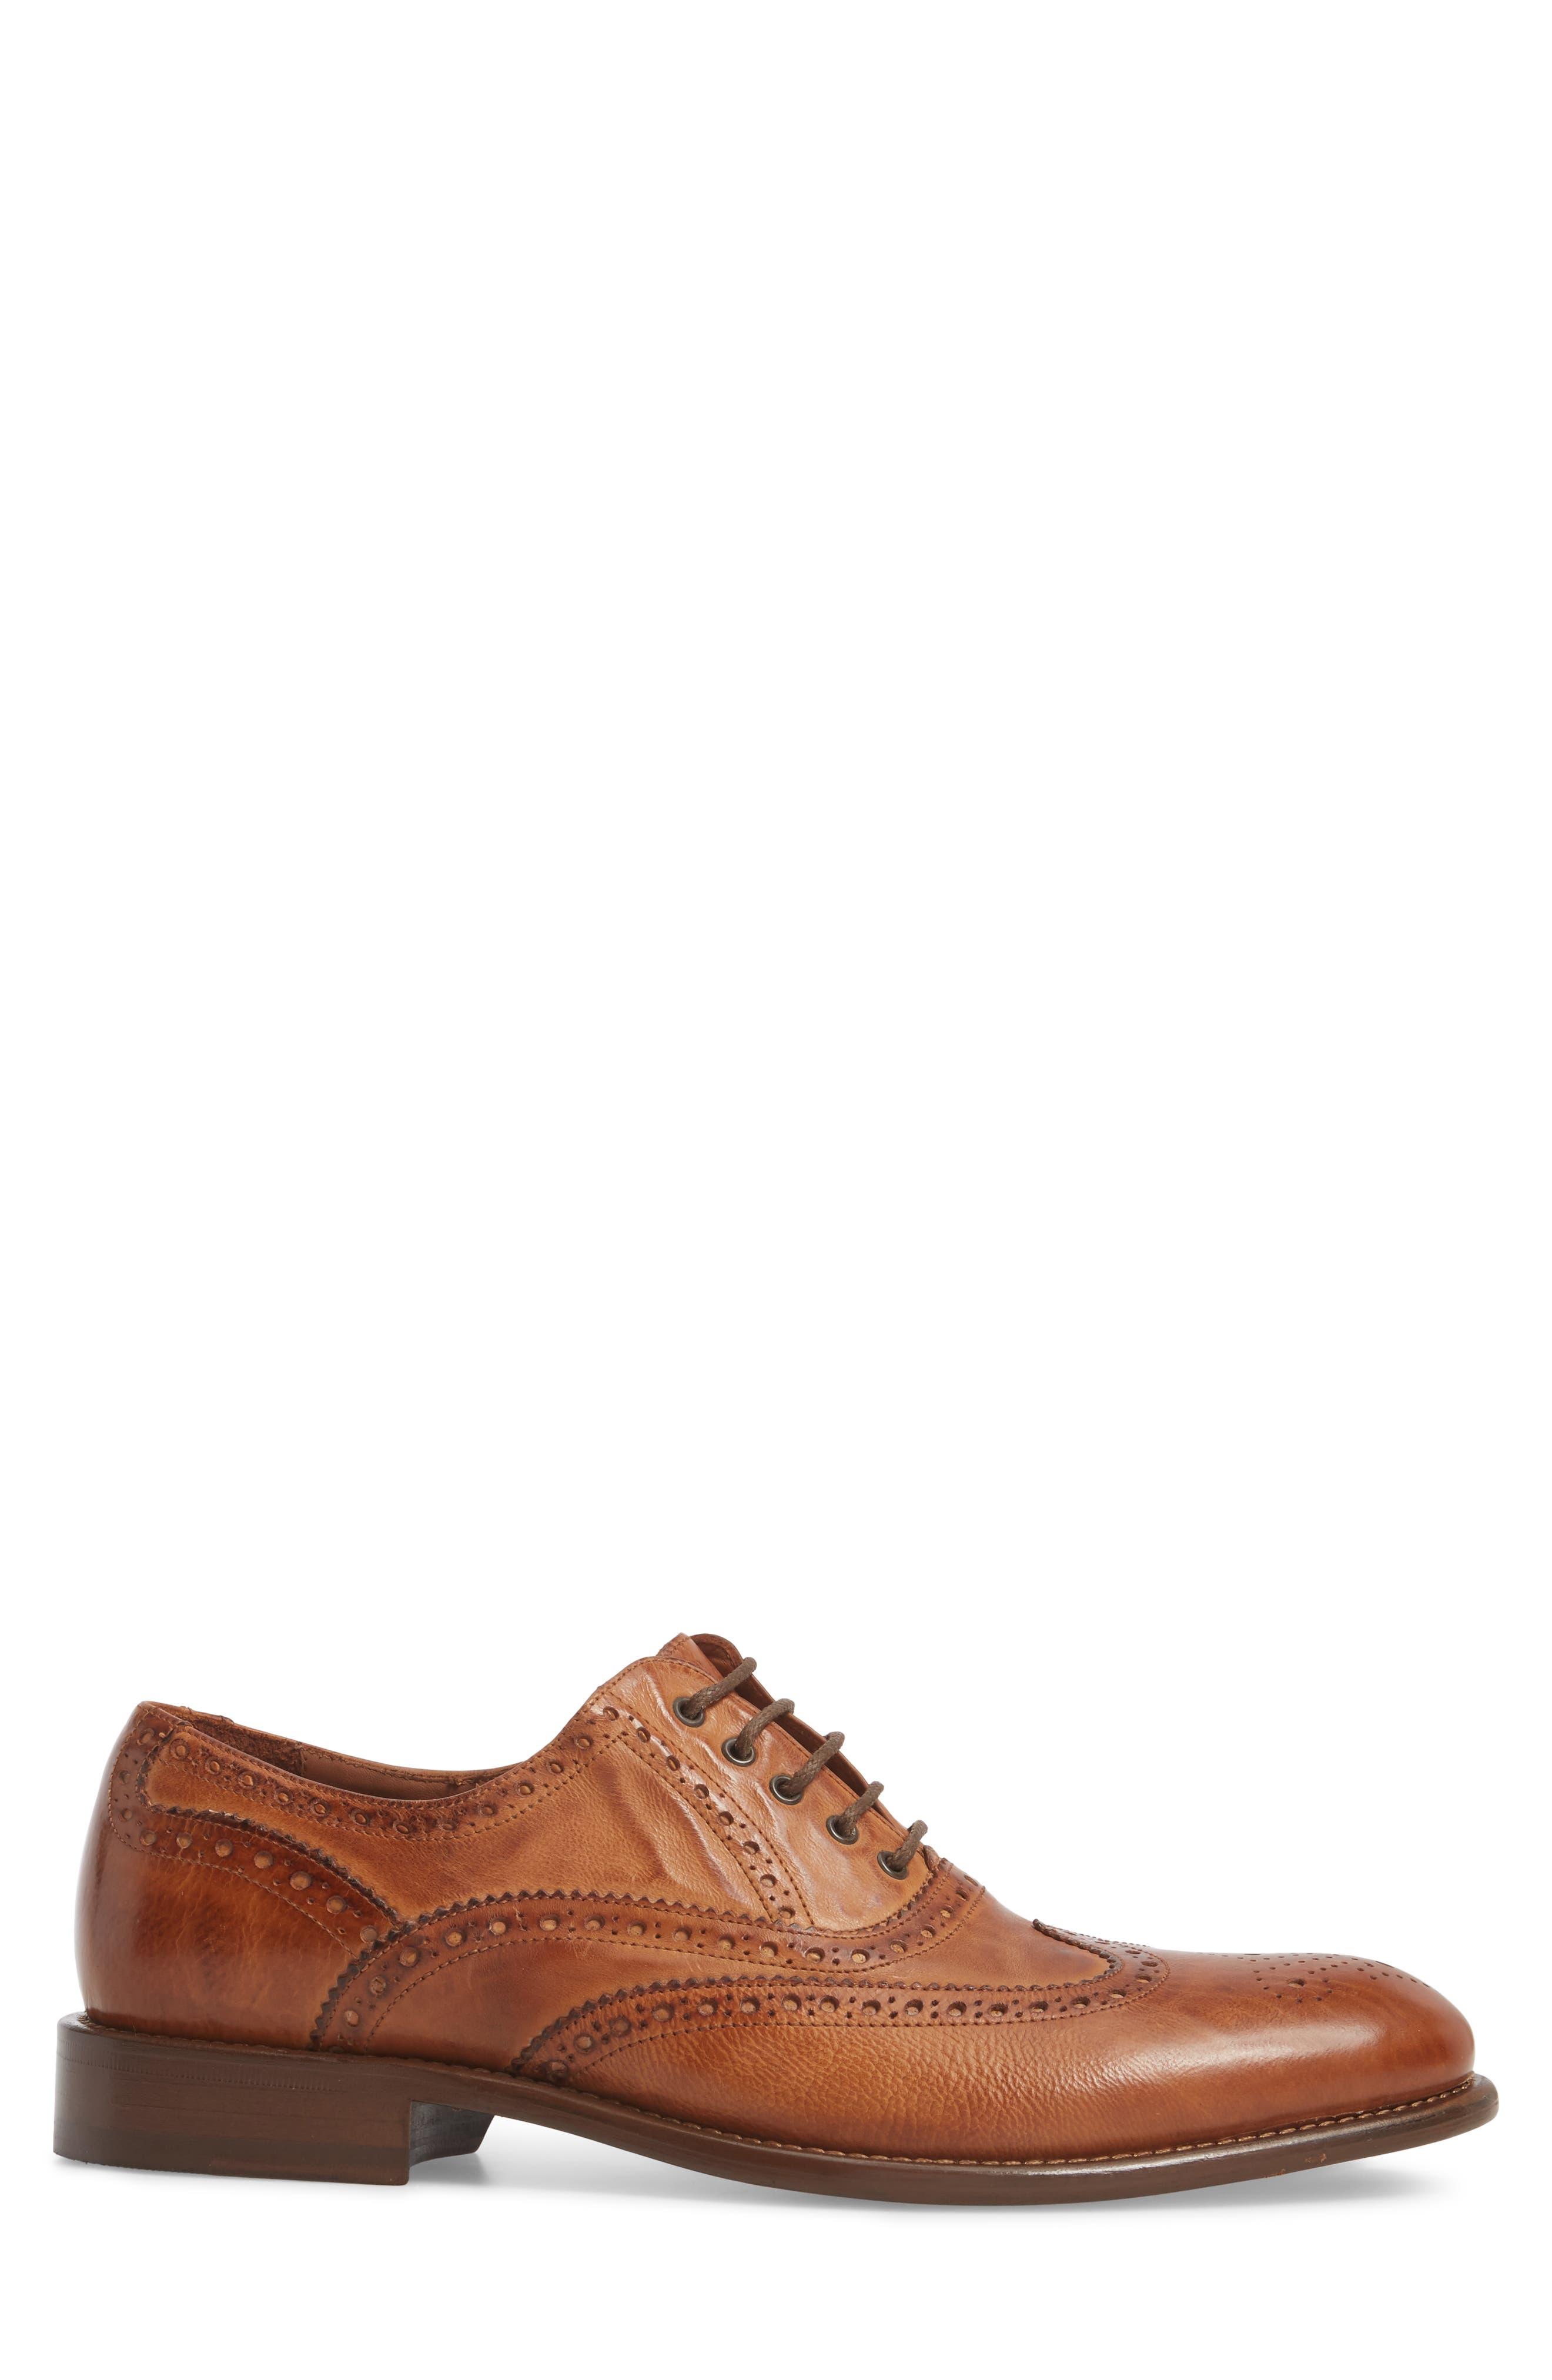 Bryson Wingtip Oxford,                             Alternate thumbnail 3, color,                             Cognac Leather